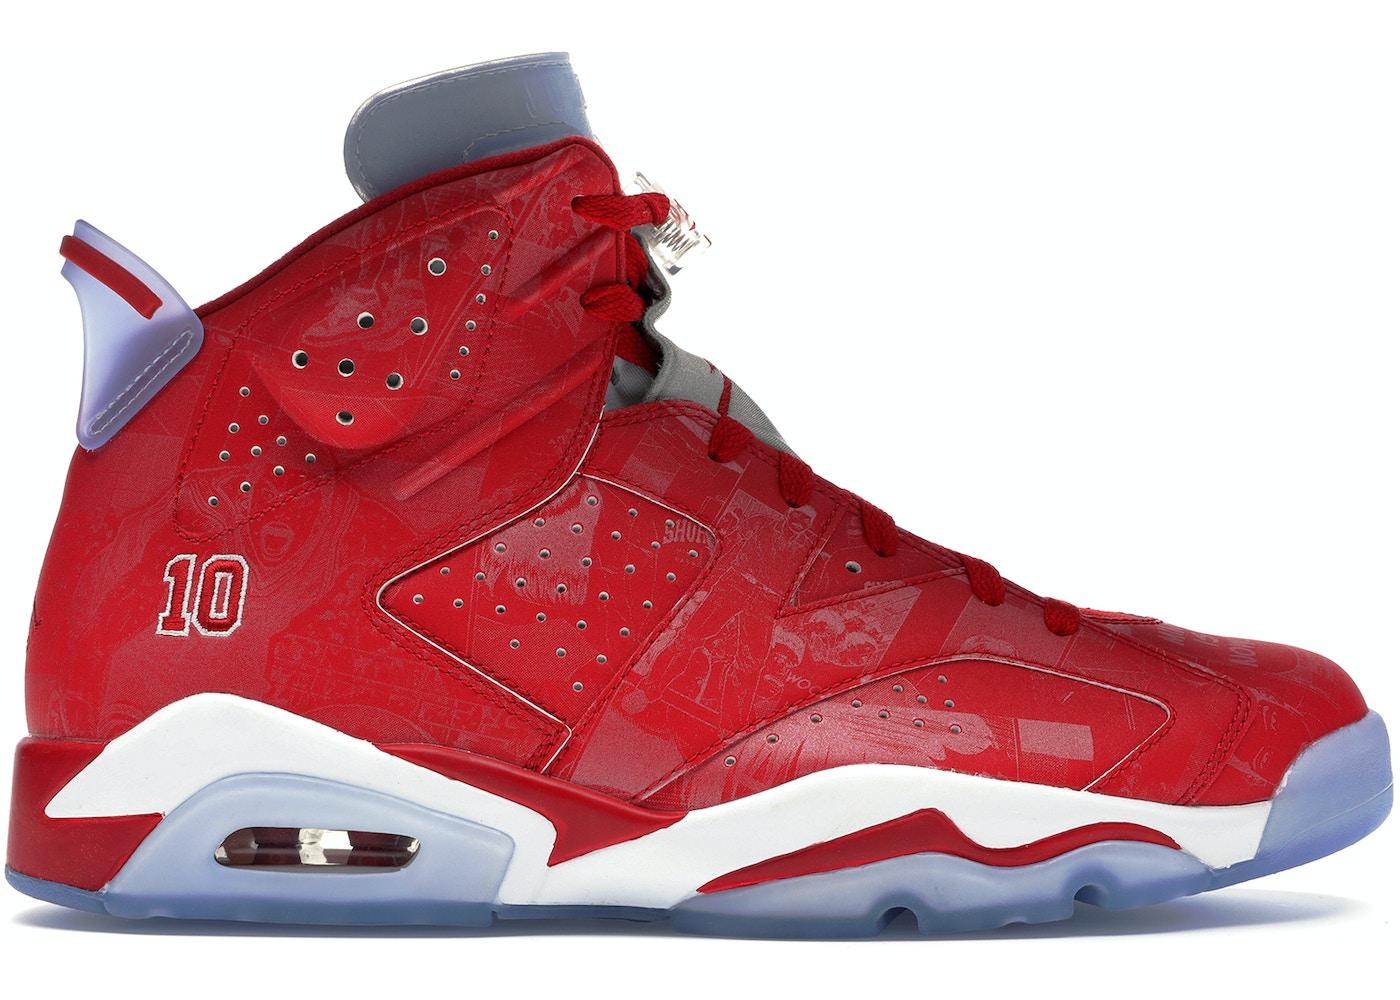 half off 5e208 05543 Air Jordan 6 Shoes - Average Sale Price